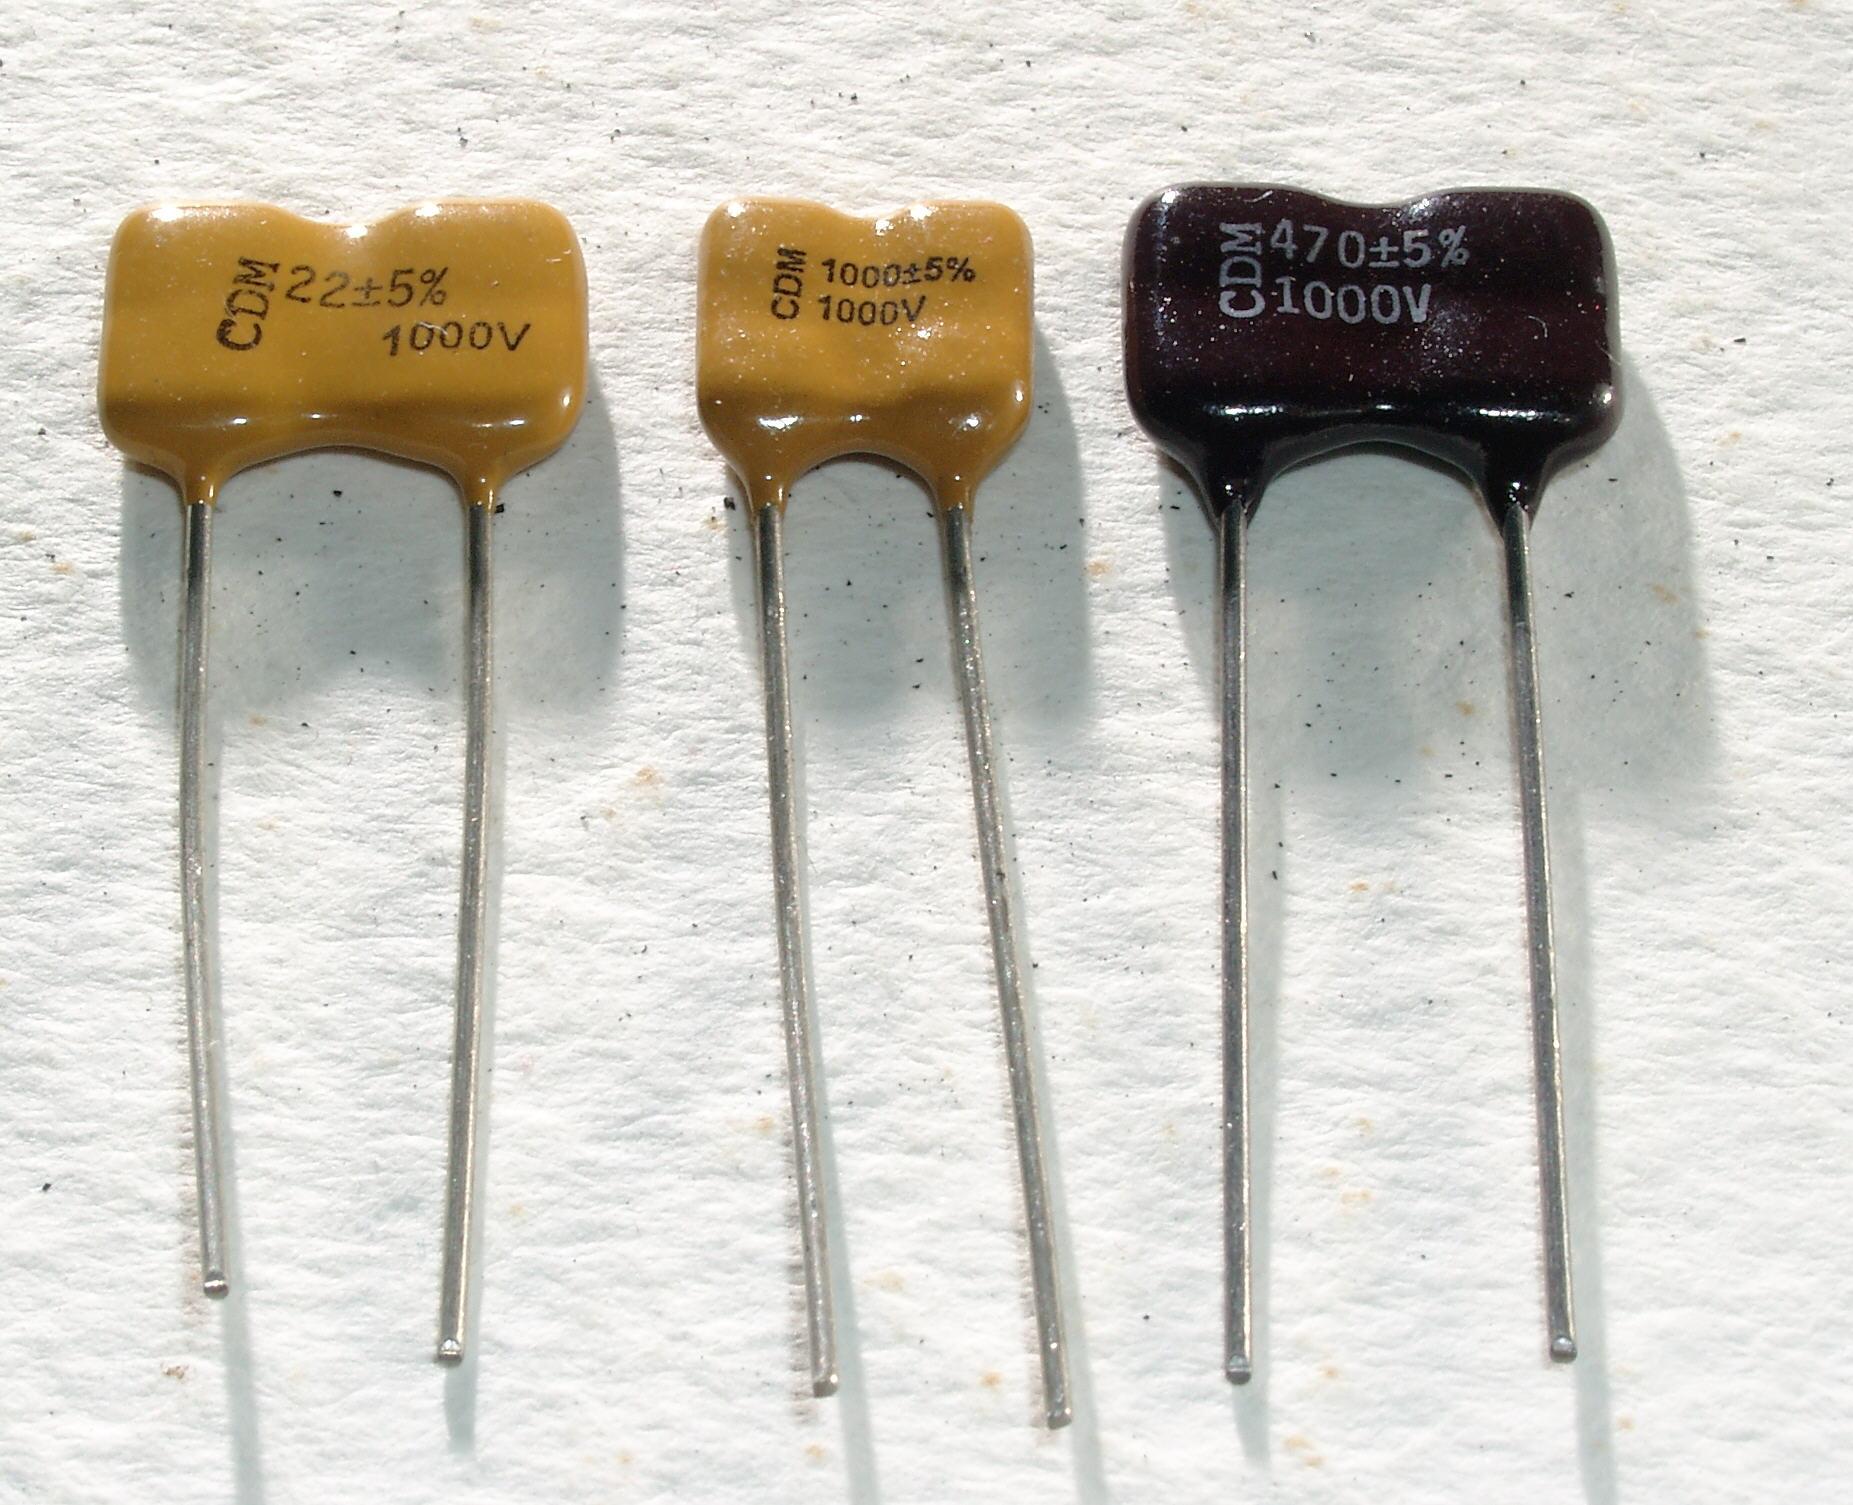 4 Glimmerkondensatoren  3900 pF  500 V 5/% Silver Mica